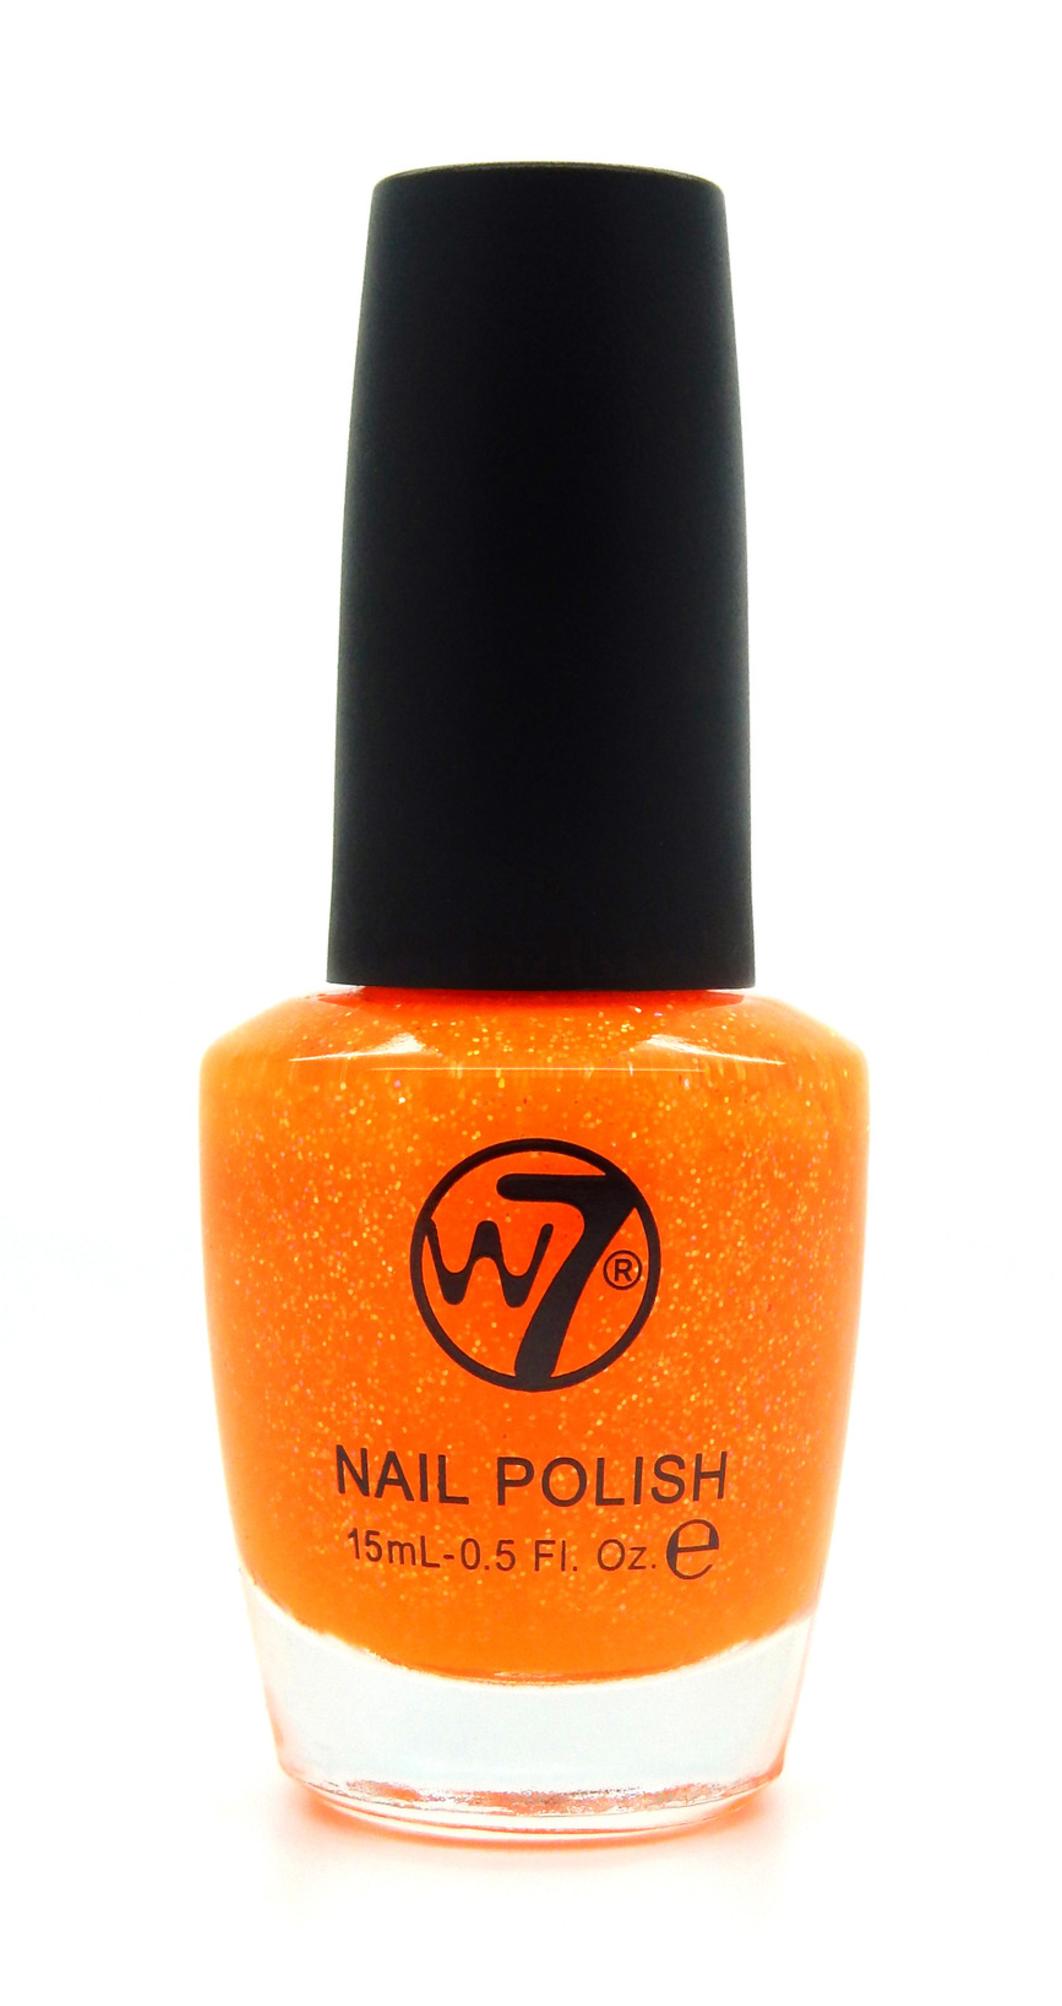 W7 Nail Polish 09 Orange Dazzle 15 ml - £1.25